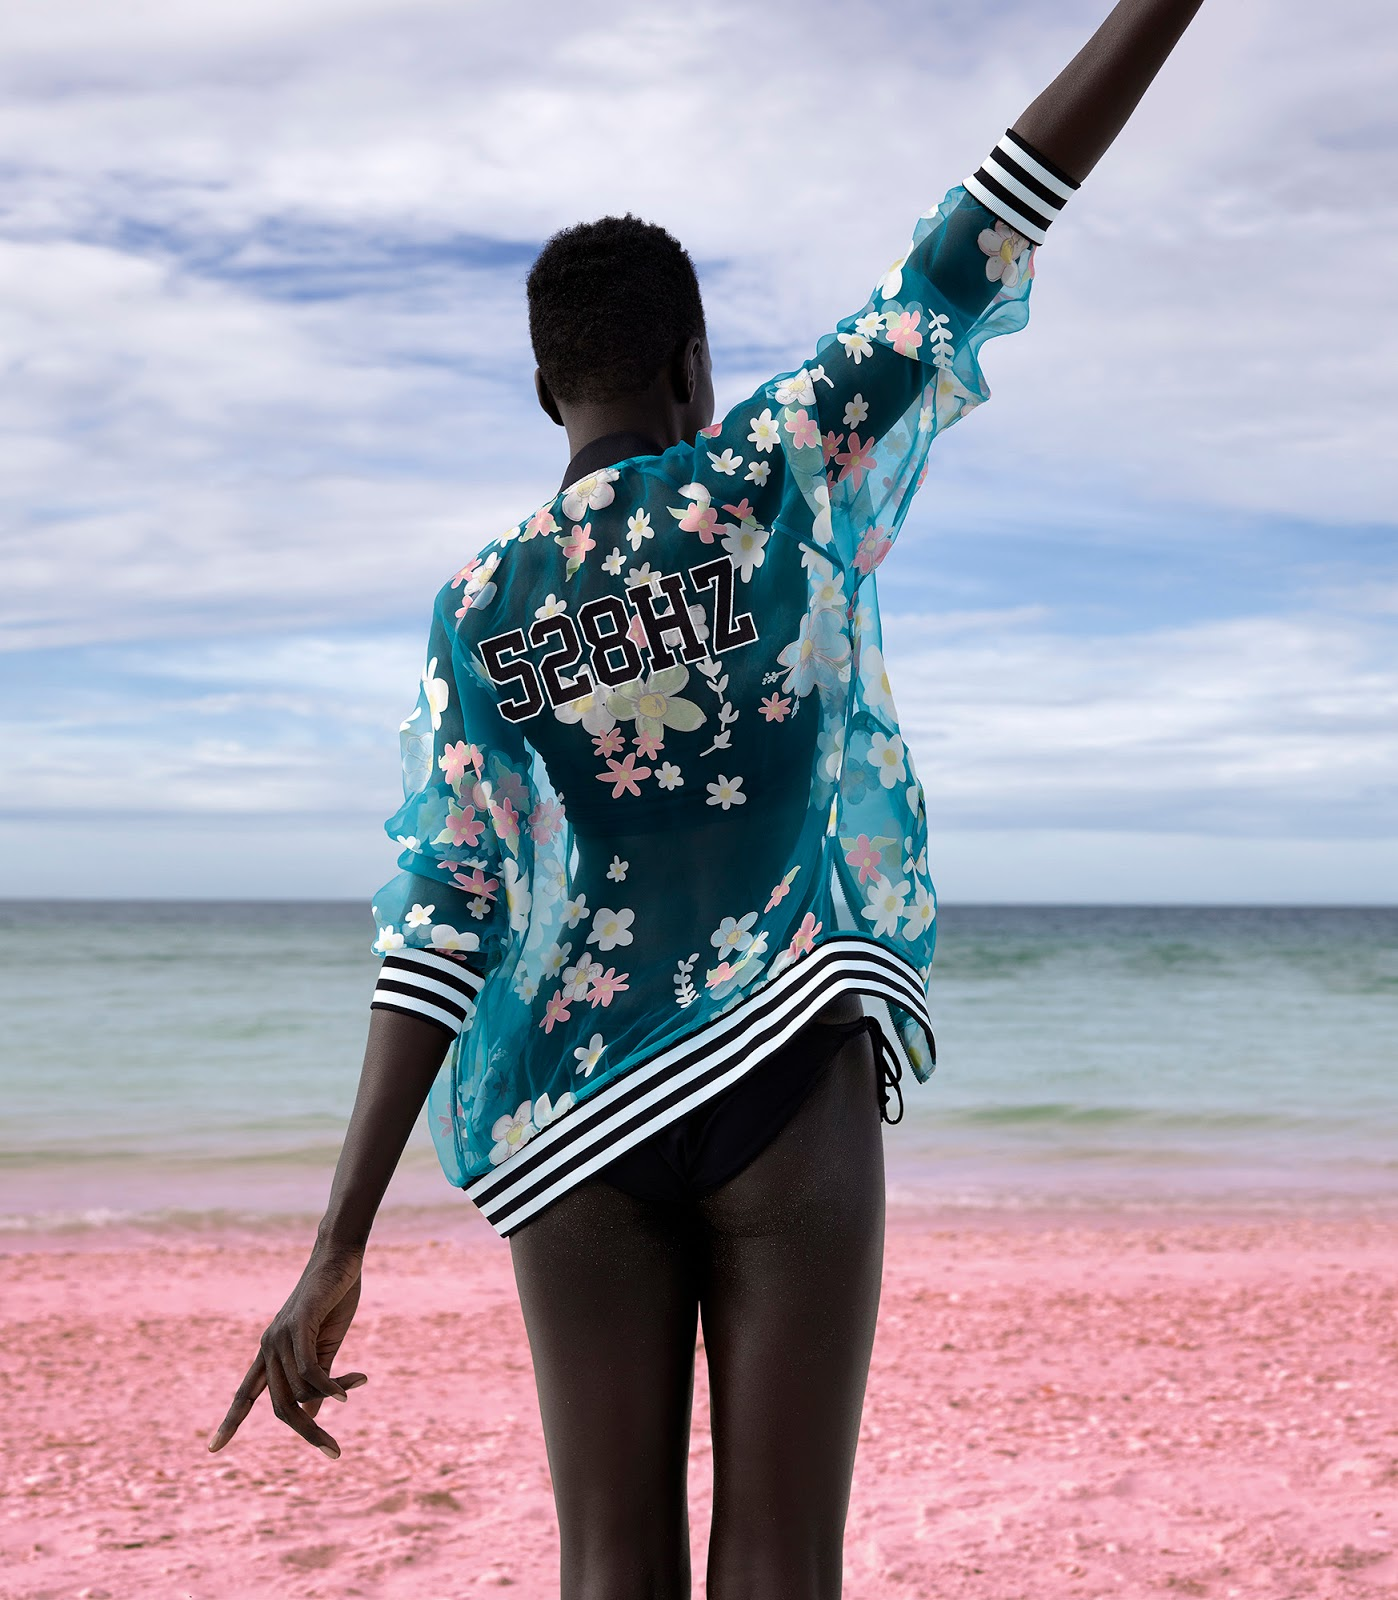 info for eb8e5 da02a adidas Originals  Pharrell Williams Drop Bold Pink Beach Collection Today